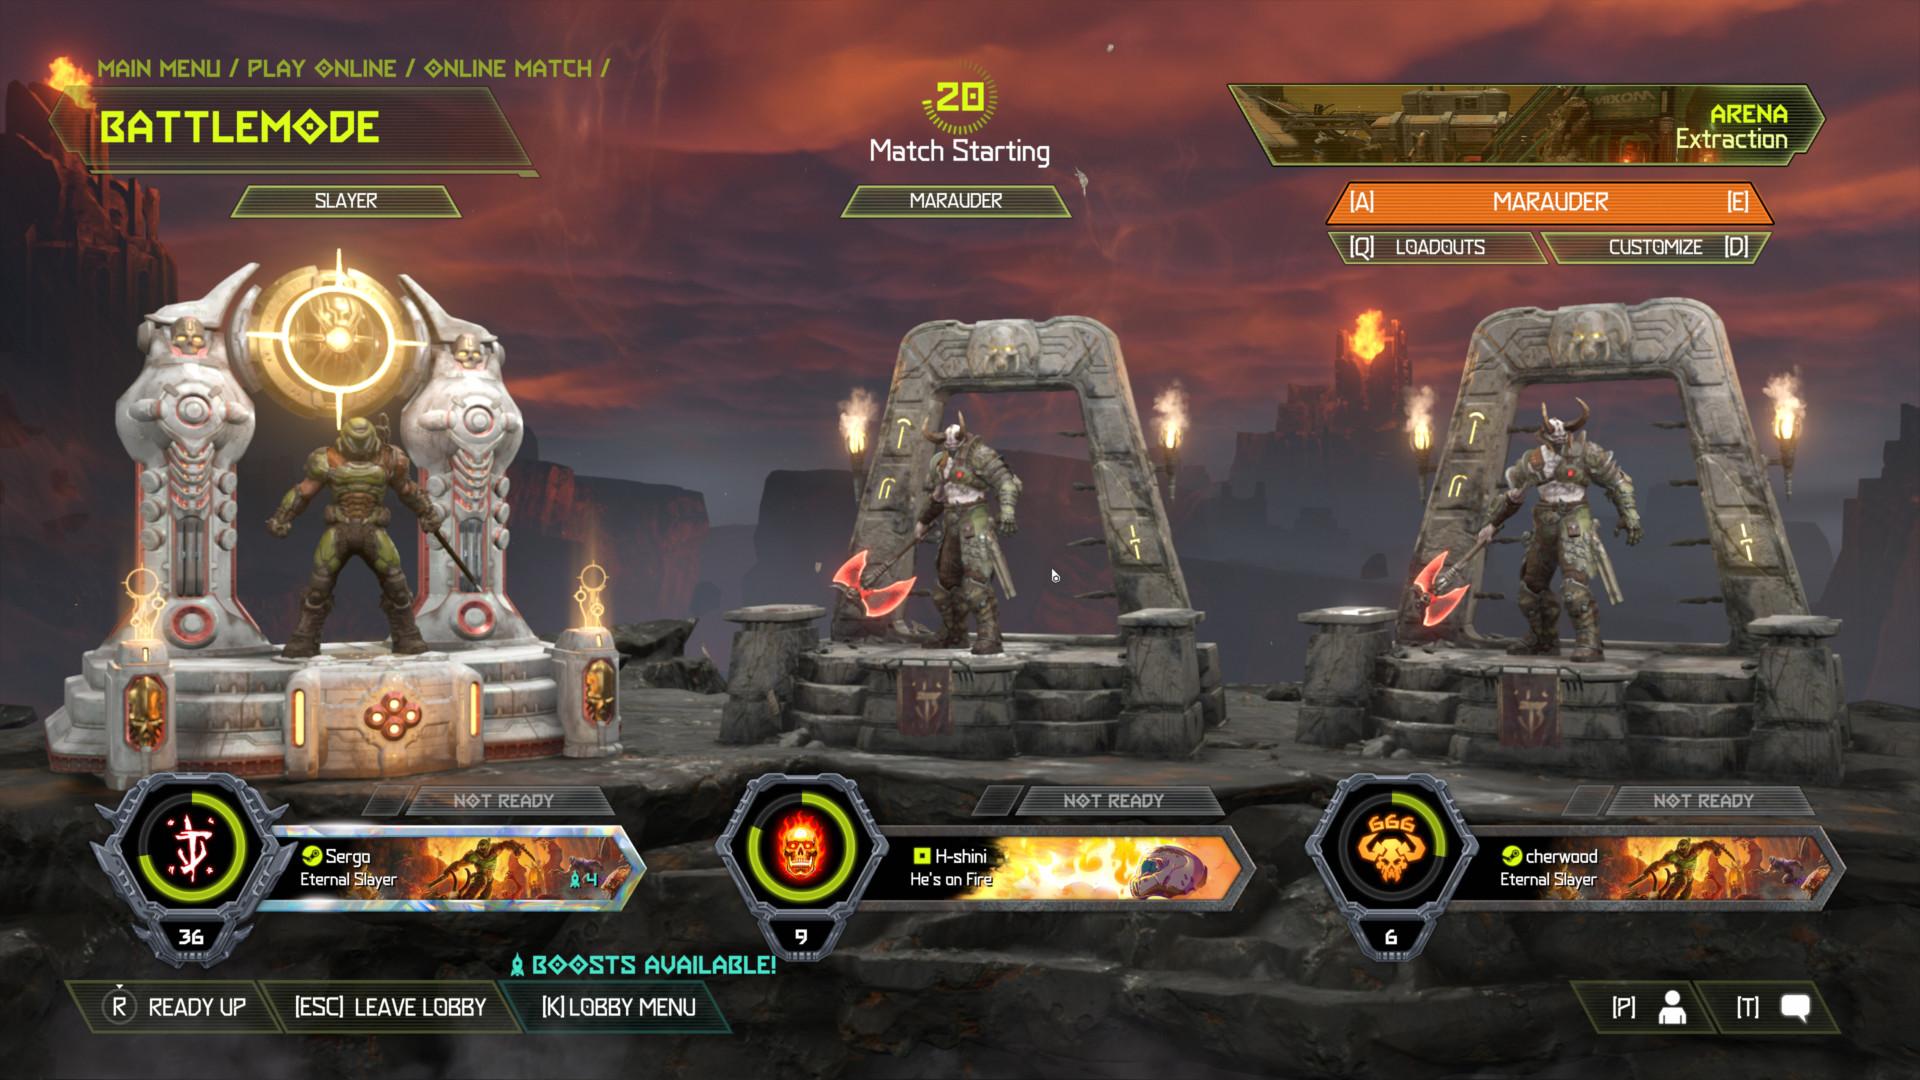 Battlemode screenshot of Doom Eternal video game interface.